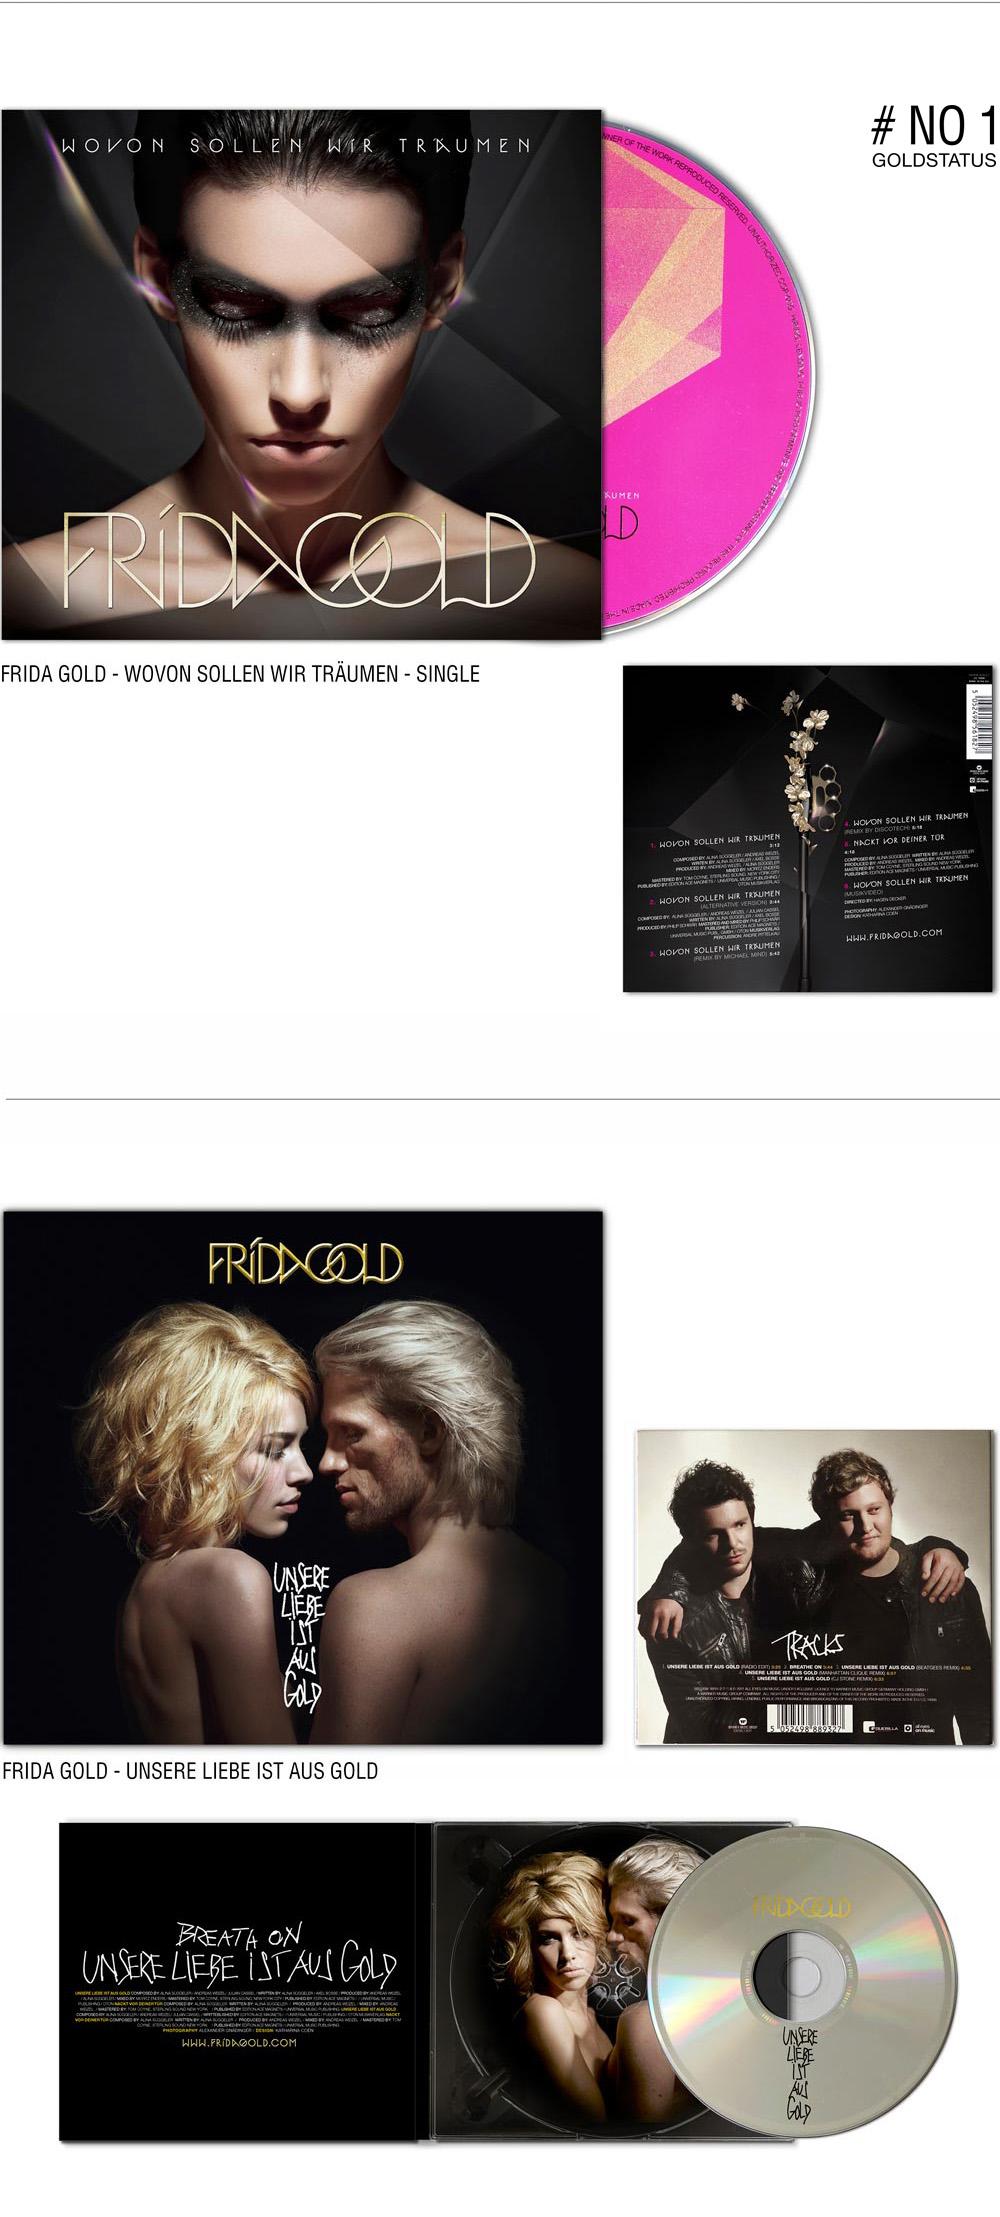 COEN Concept & Design Berlin - Frida Gold